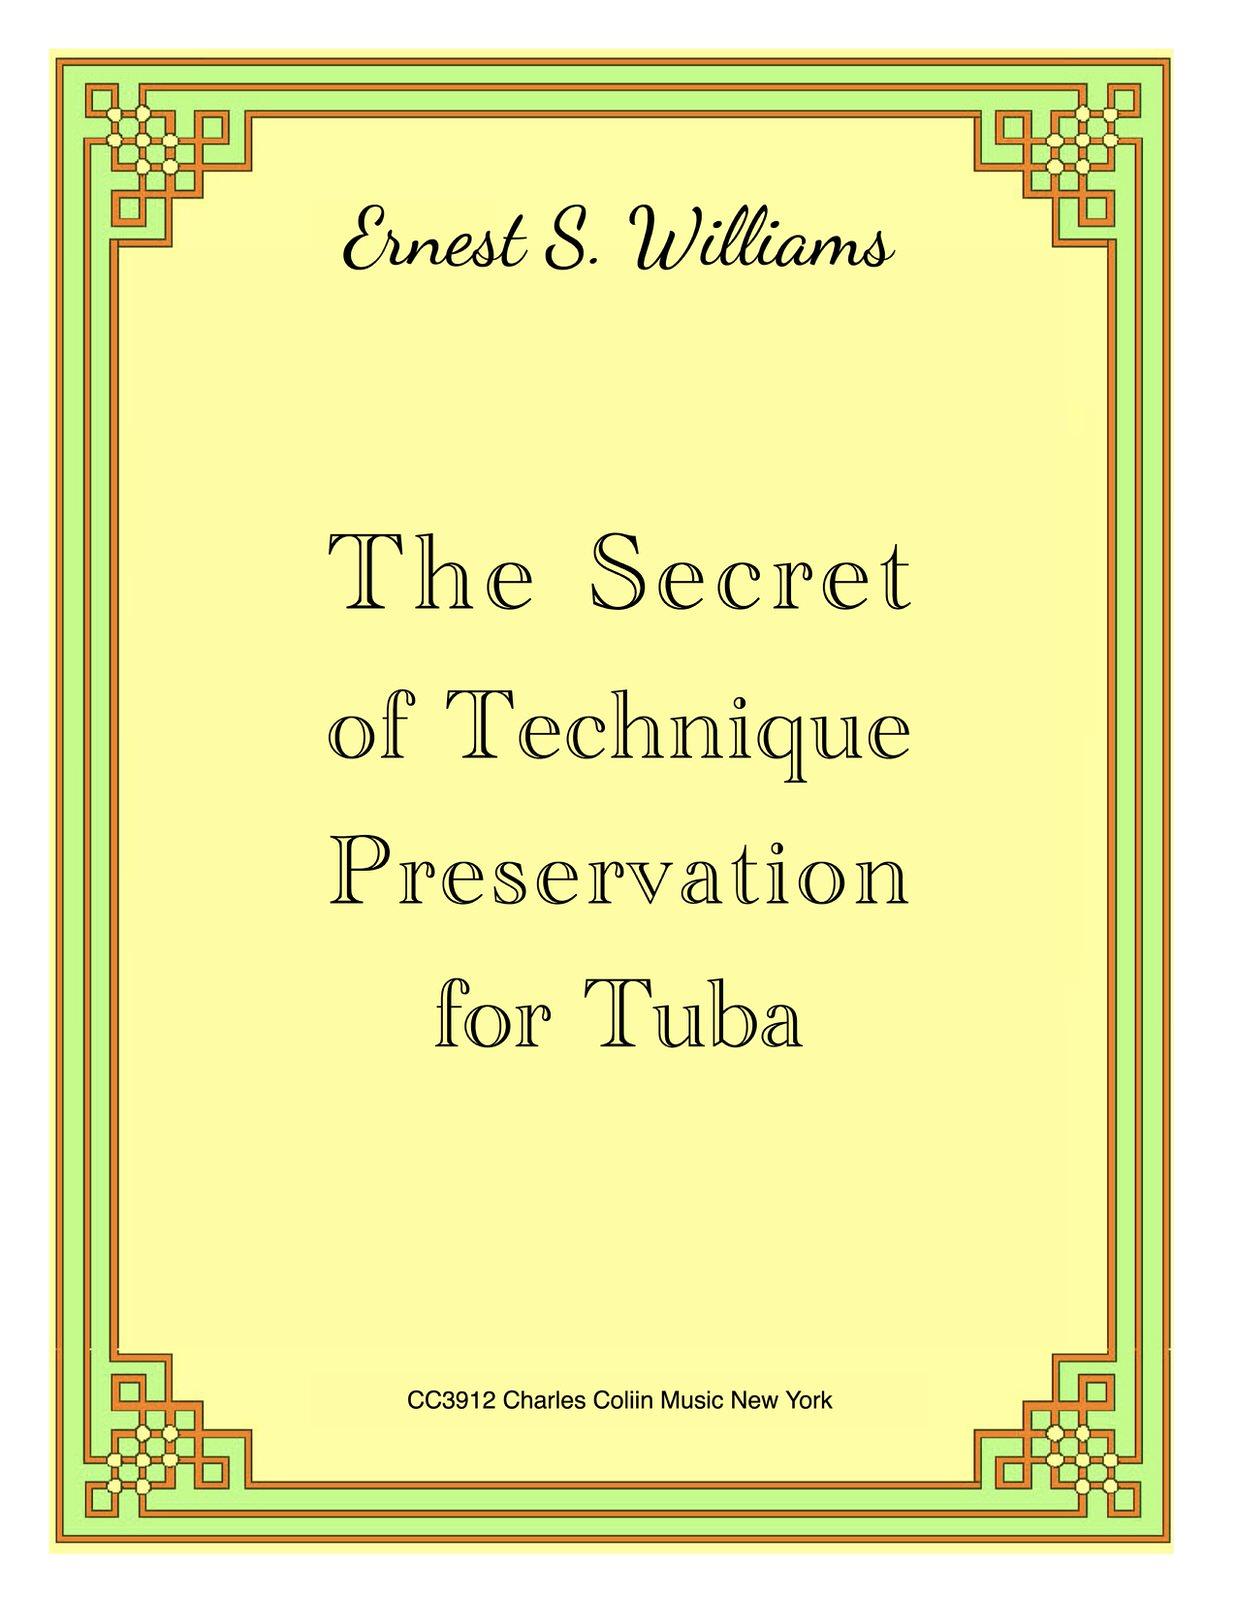 Williams, Secret of Technique Preservation for Tuba Keep Copyrights-p01